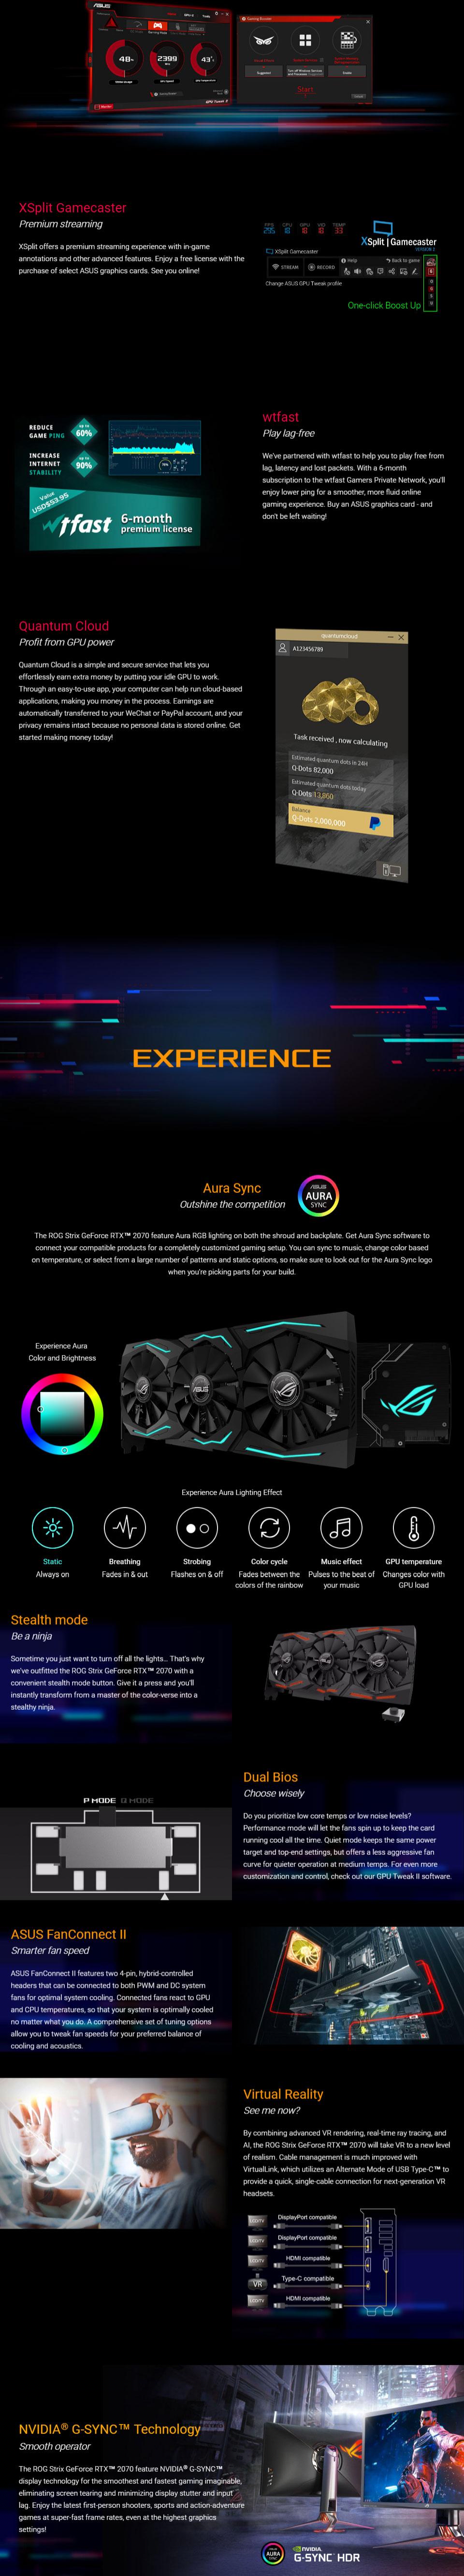 rog-strix-rtx2070-o8g-gaming-f-02.jpg